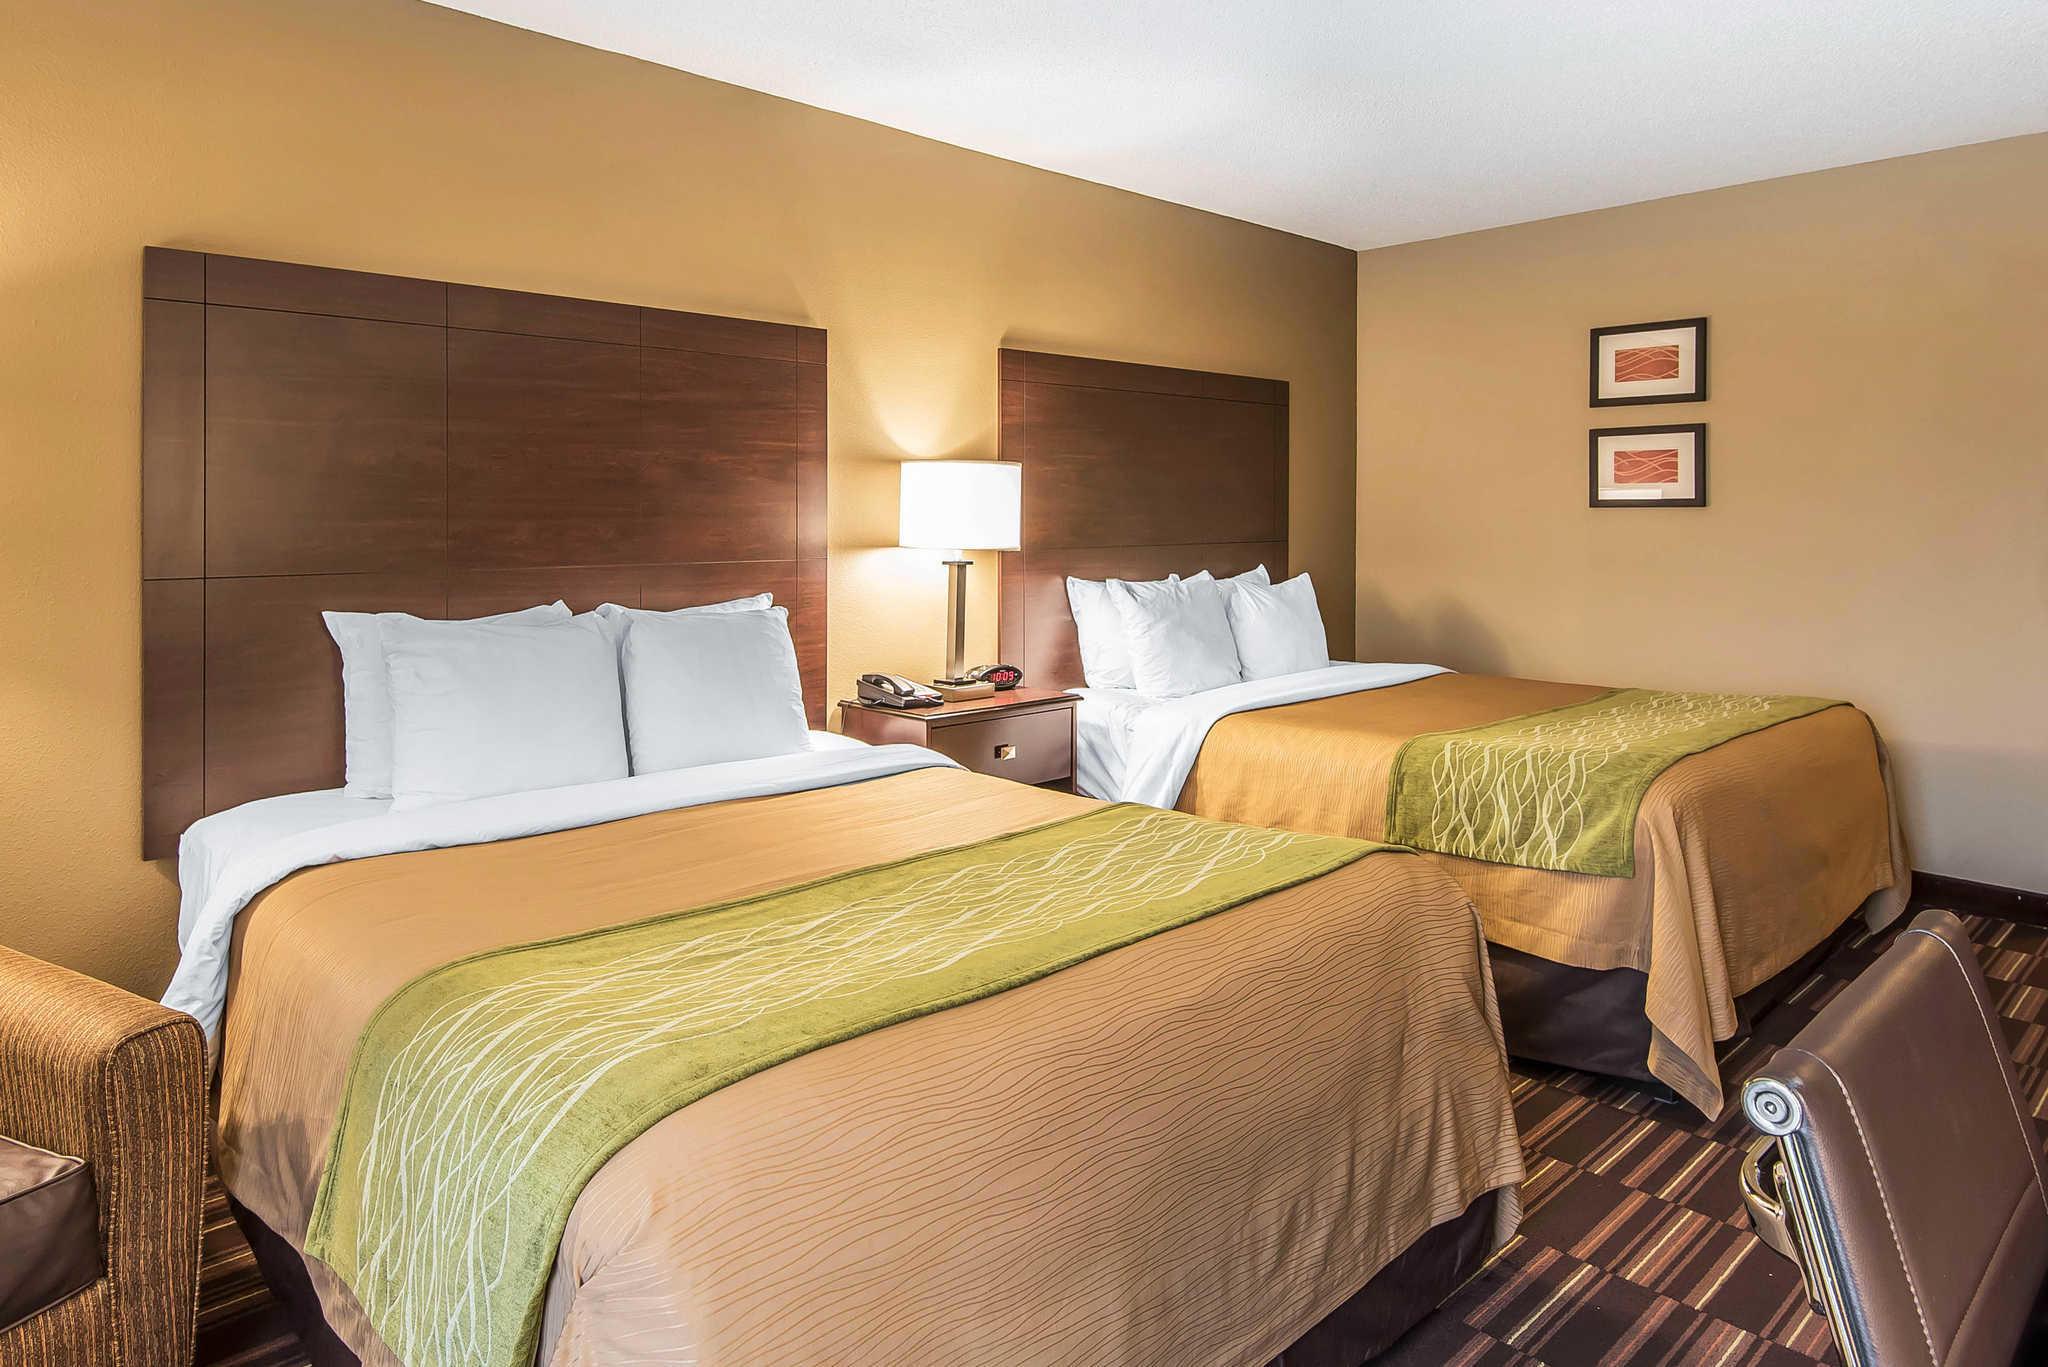 Comfort Inn & Suites Kansas City - Northeast image 13